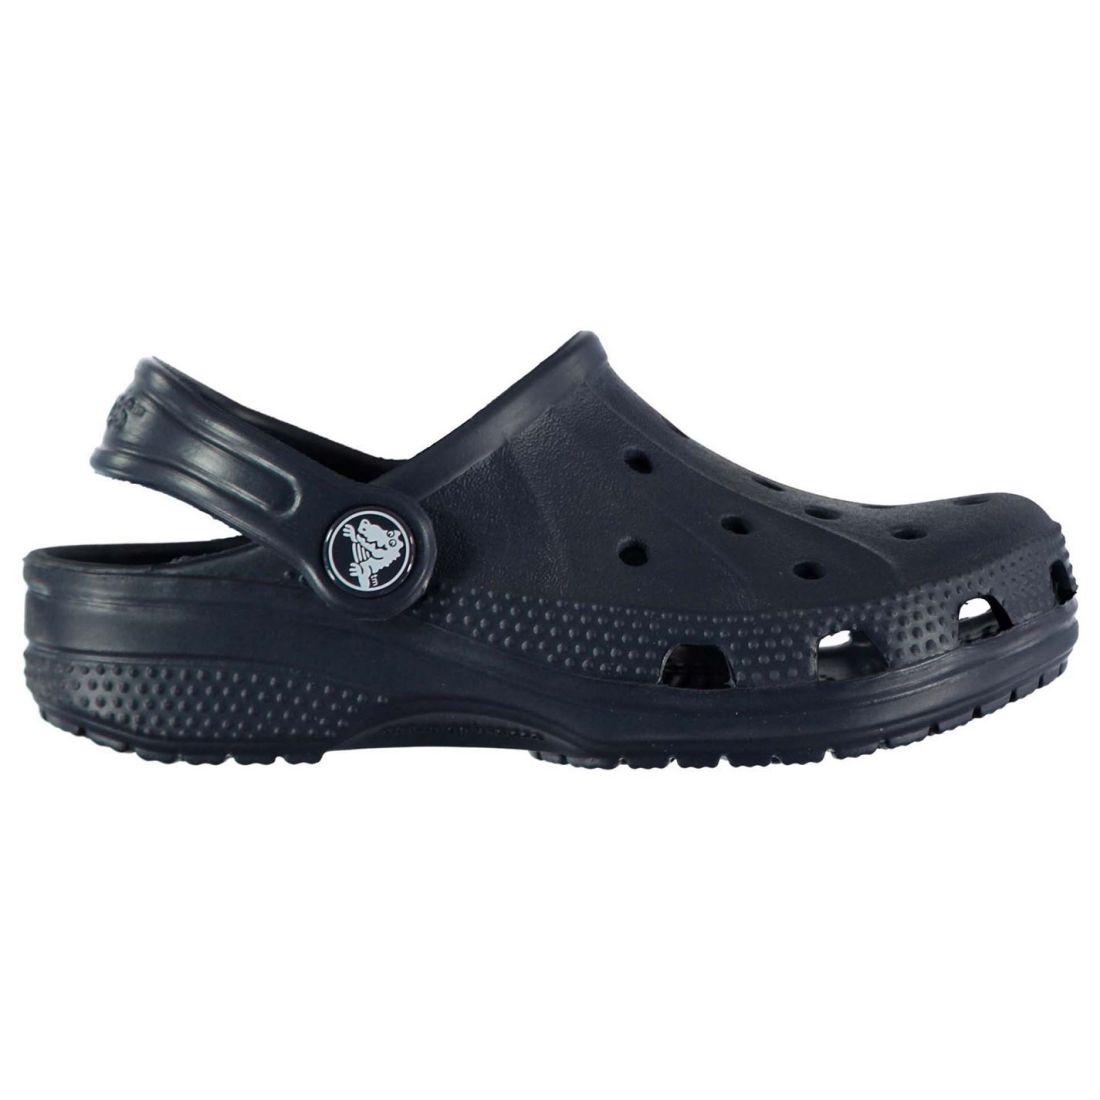 7030494c4 Details about Crocs Kids Ralen Clogs Shoes Mules Slippers Sandals Unisex  Slip On Leather